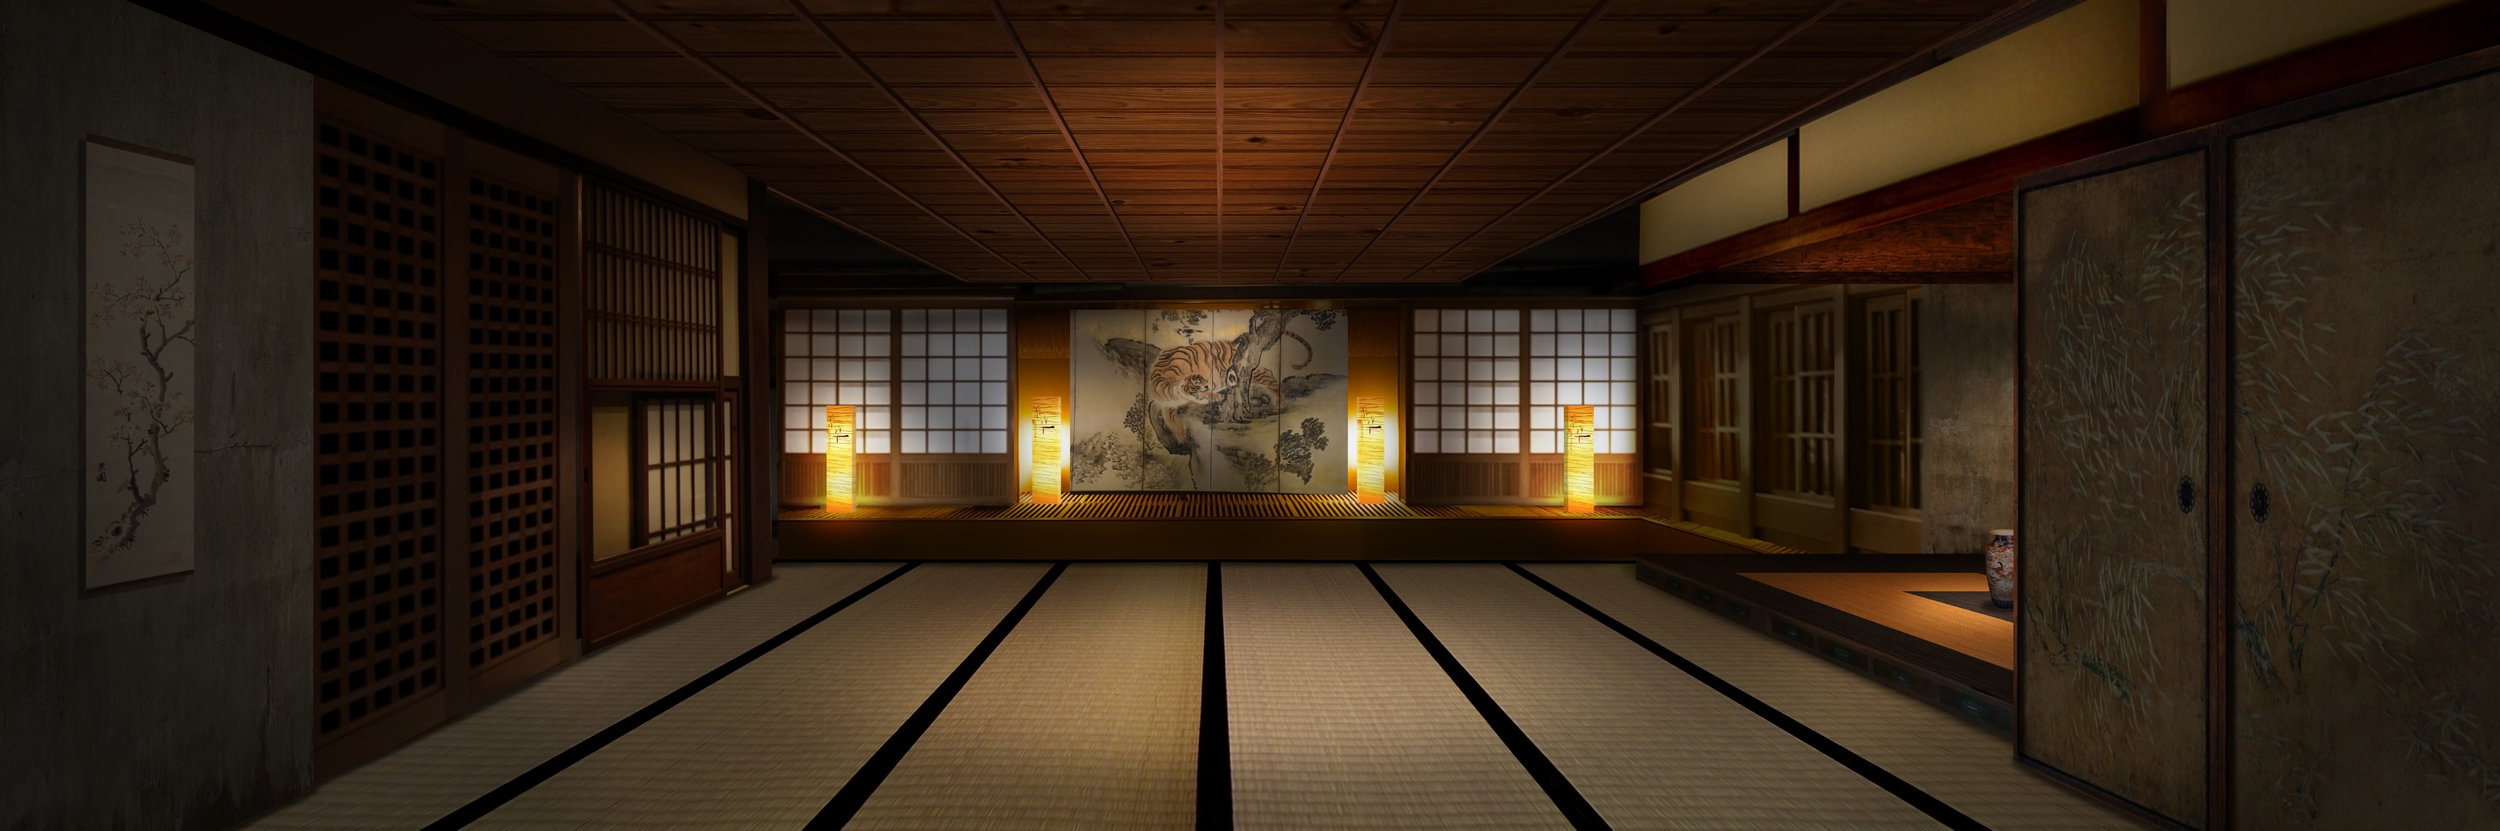 KUNOICHI_Japanese_Inn_2.jpg